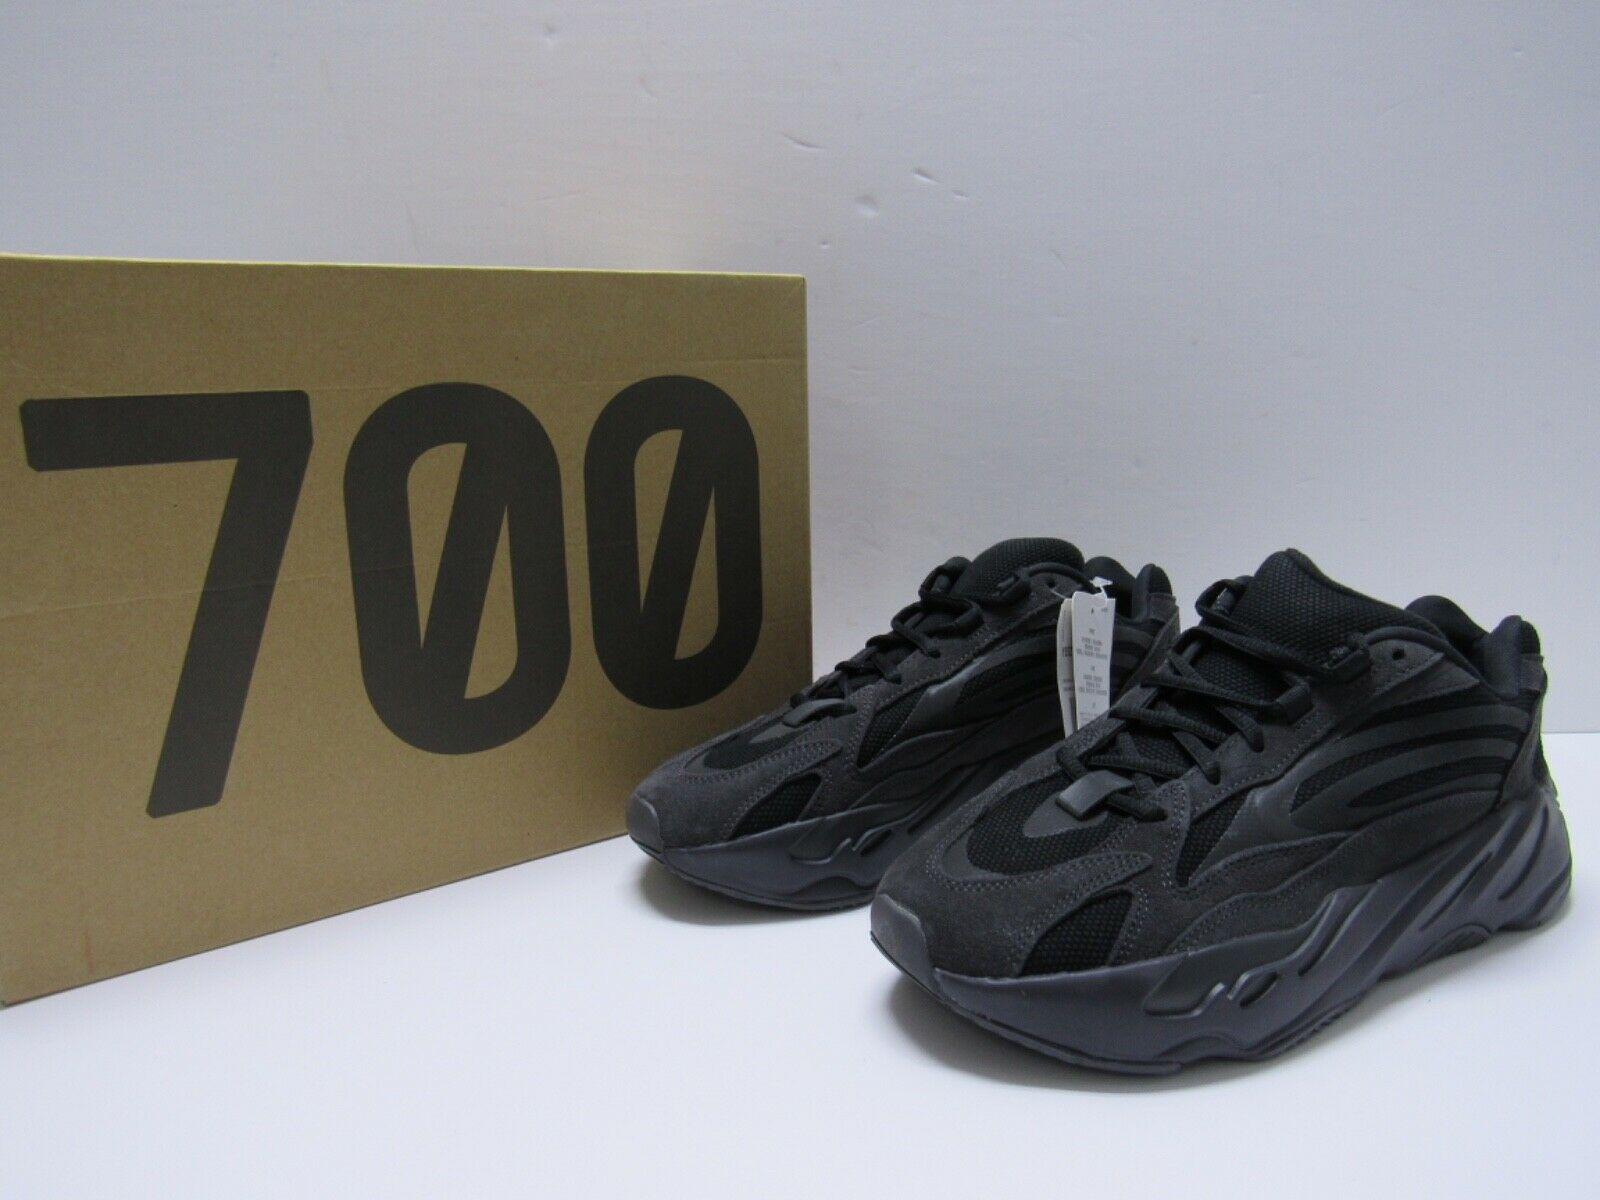 700 v2 triple black